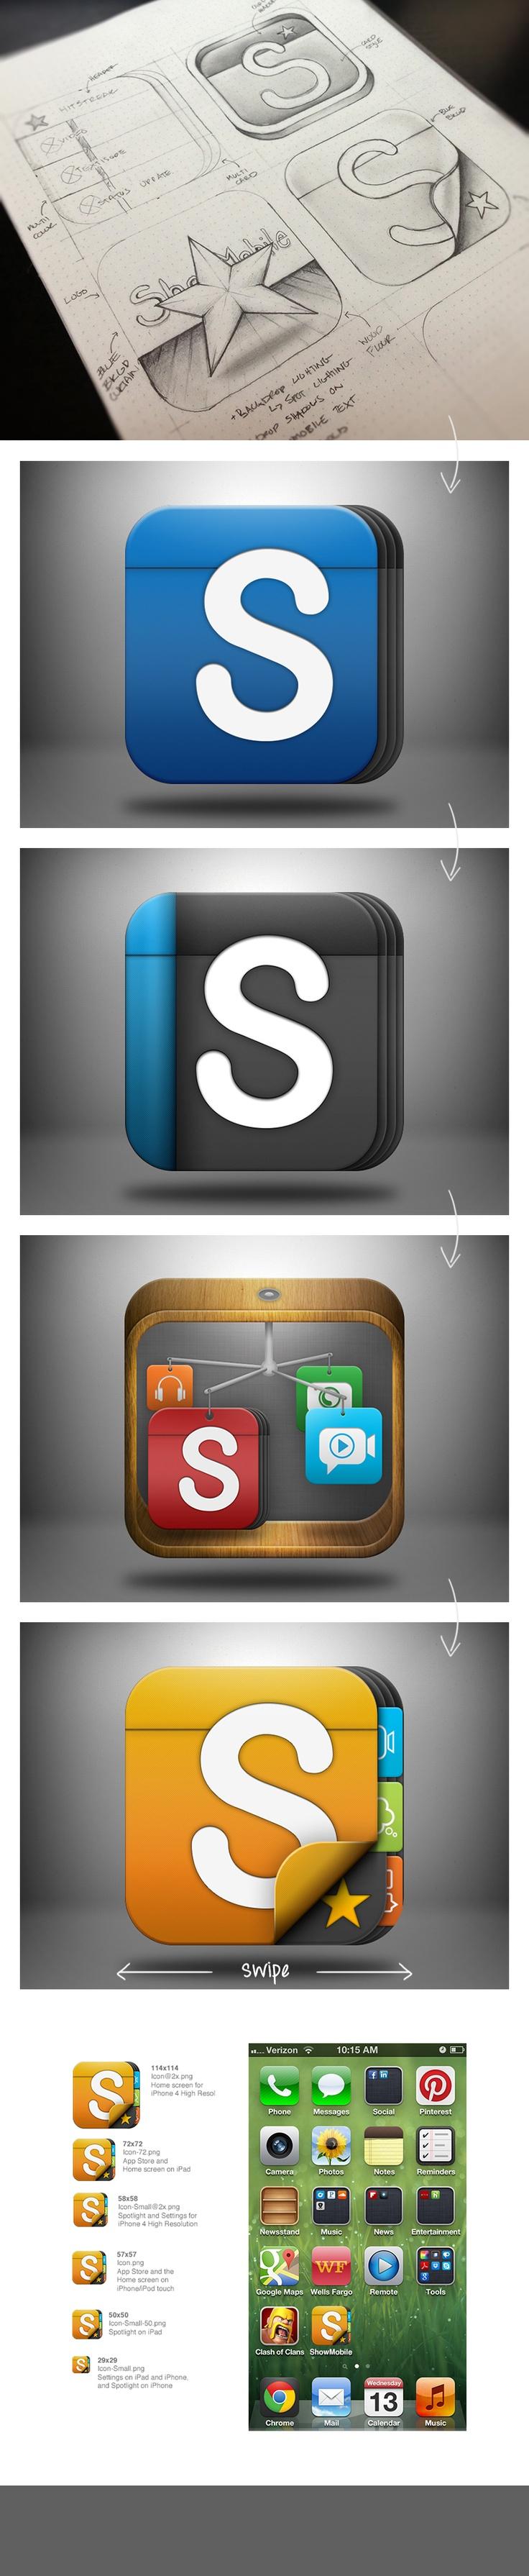 Presentation app - YouTube